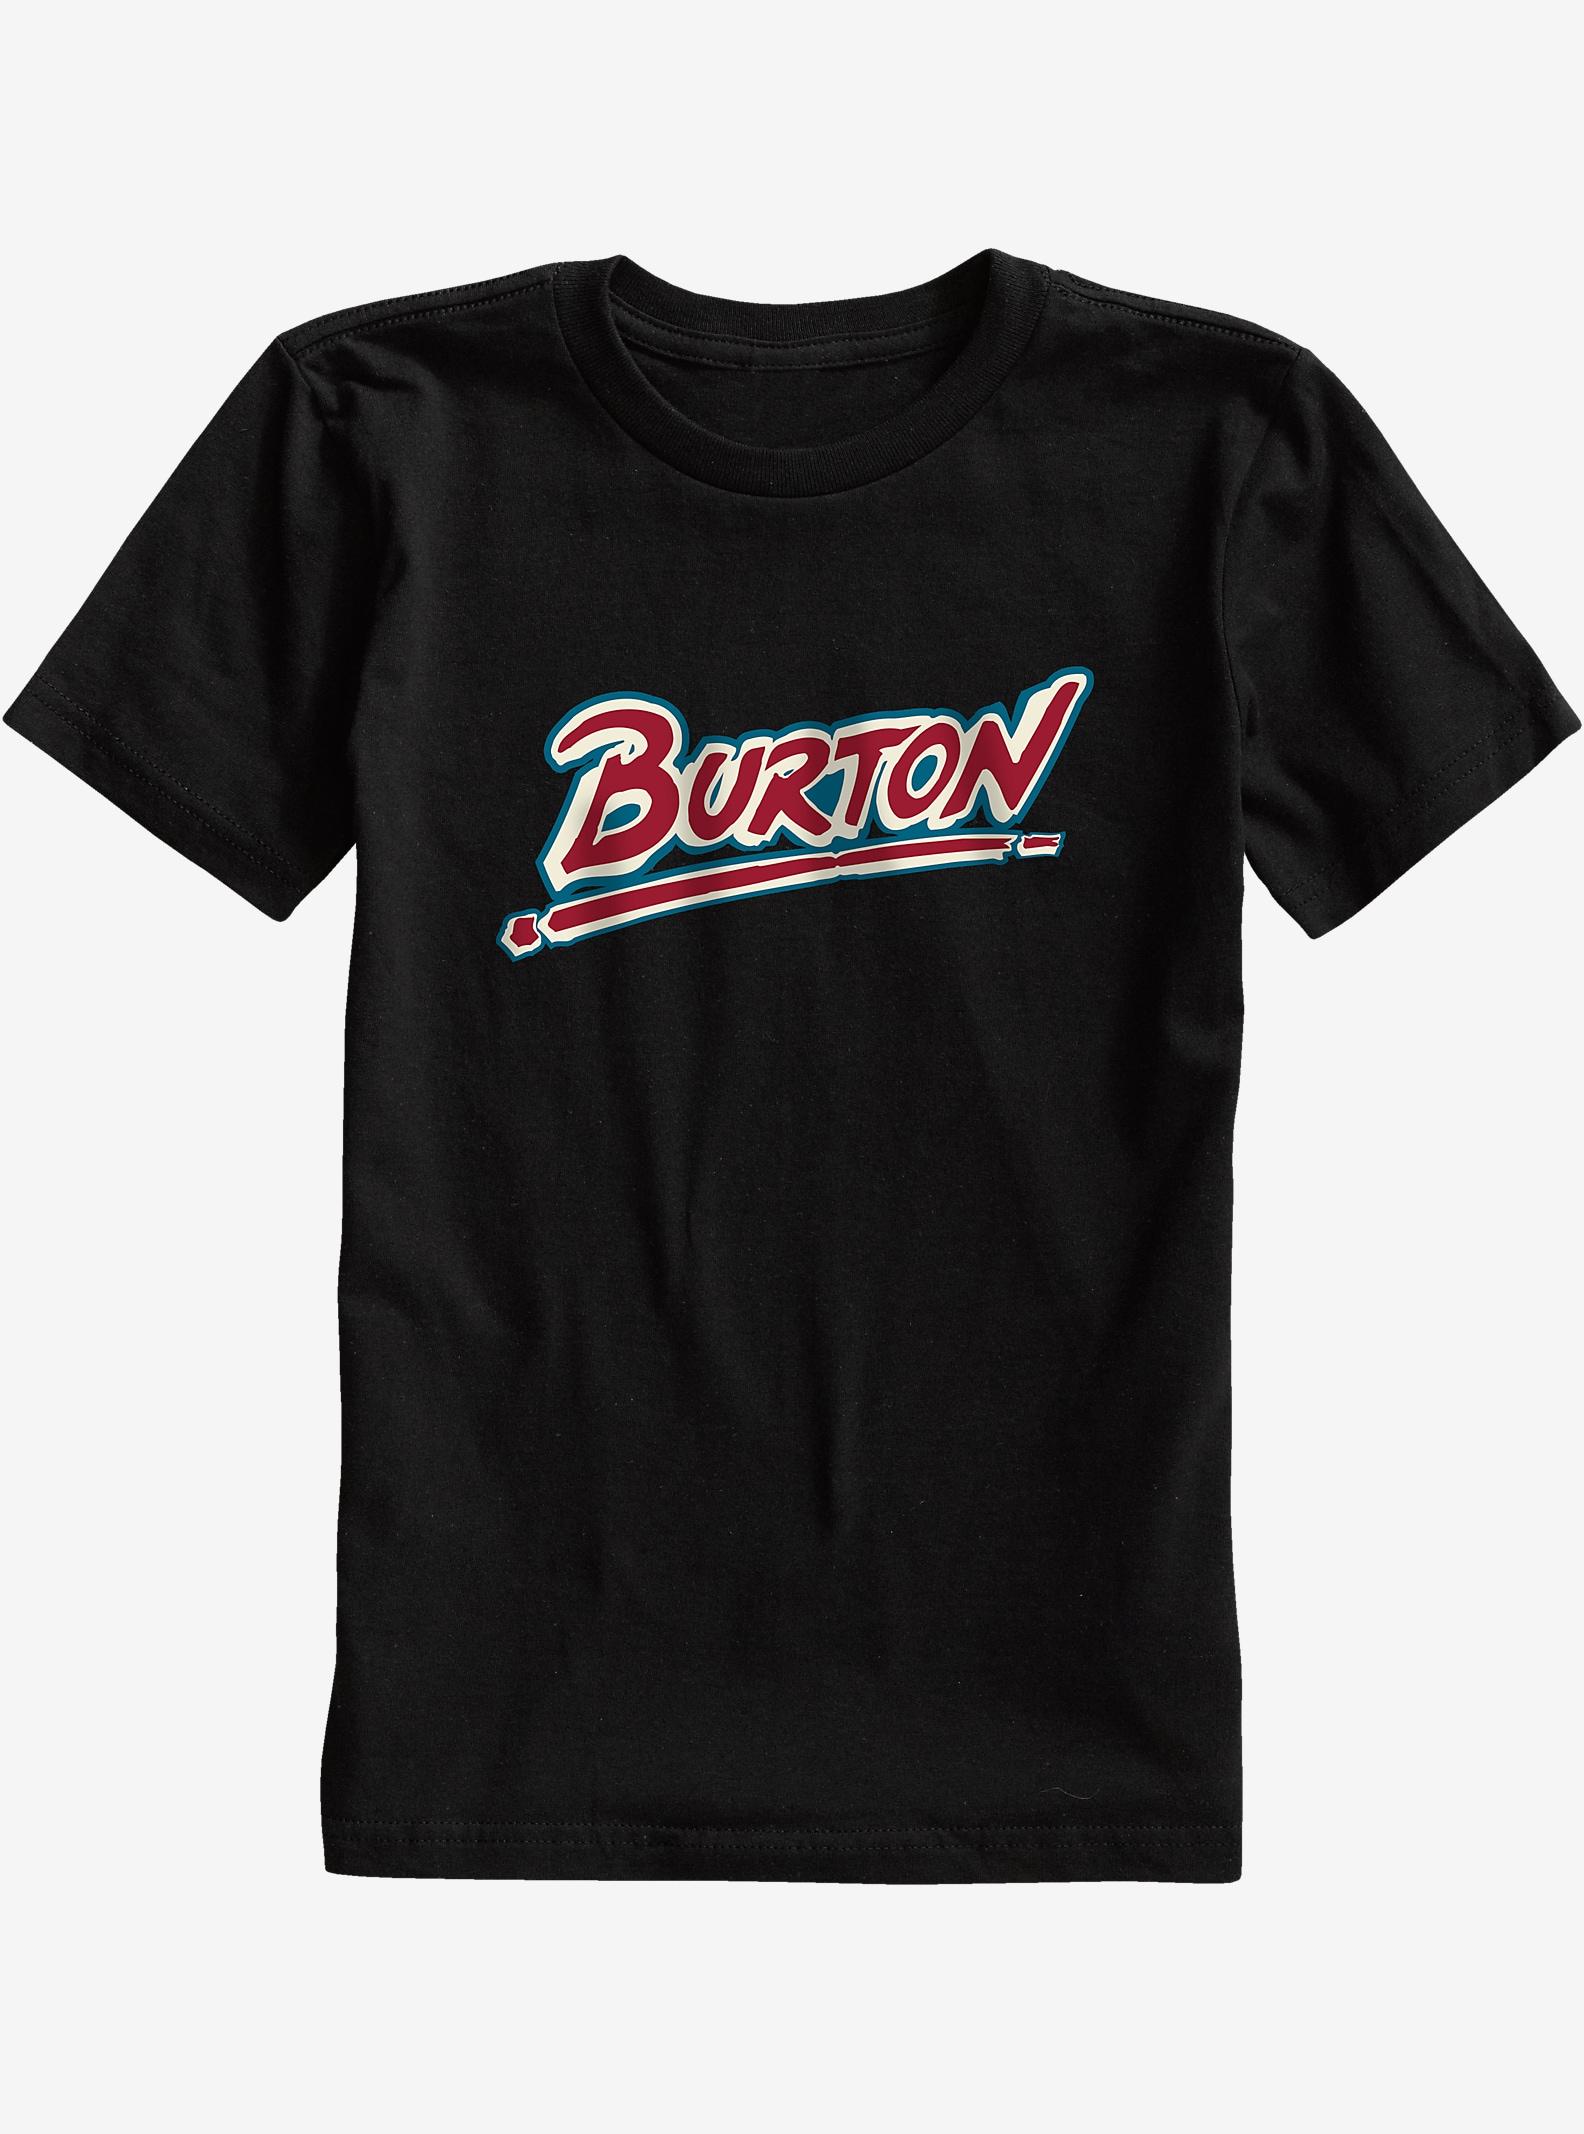 Burton Boys' Big Up Short Sleeve T Shirt shown in True Black